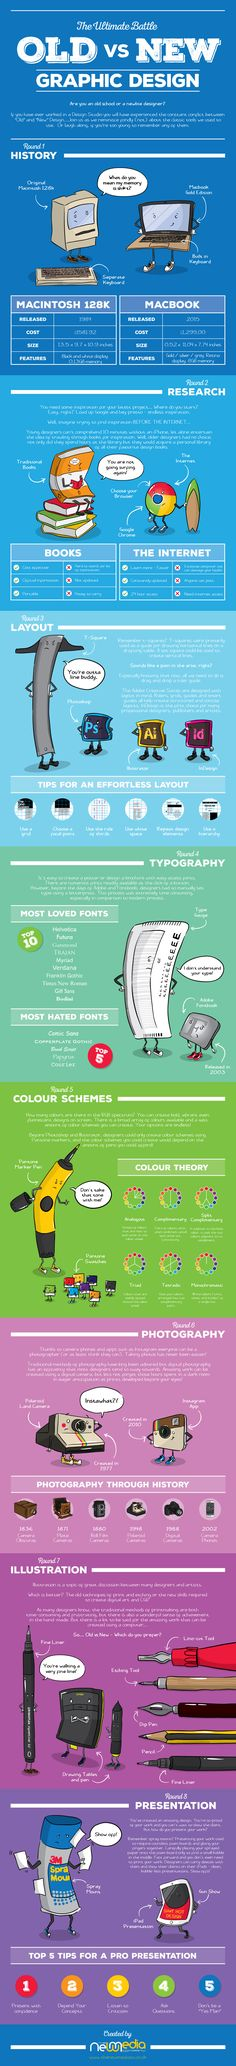 The Ultimate Battle - Old vs New - Graphic Design - Infographic http://snip.ly/z9Lr?utm_content=buffer6d4fb&utm_medium=social&utm_source=pinterest.com&utm_campaign=buffer